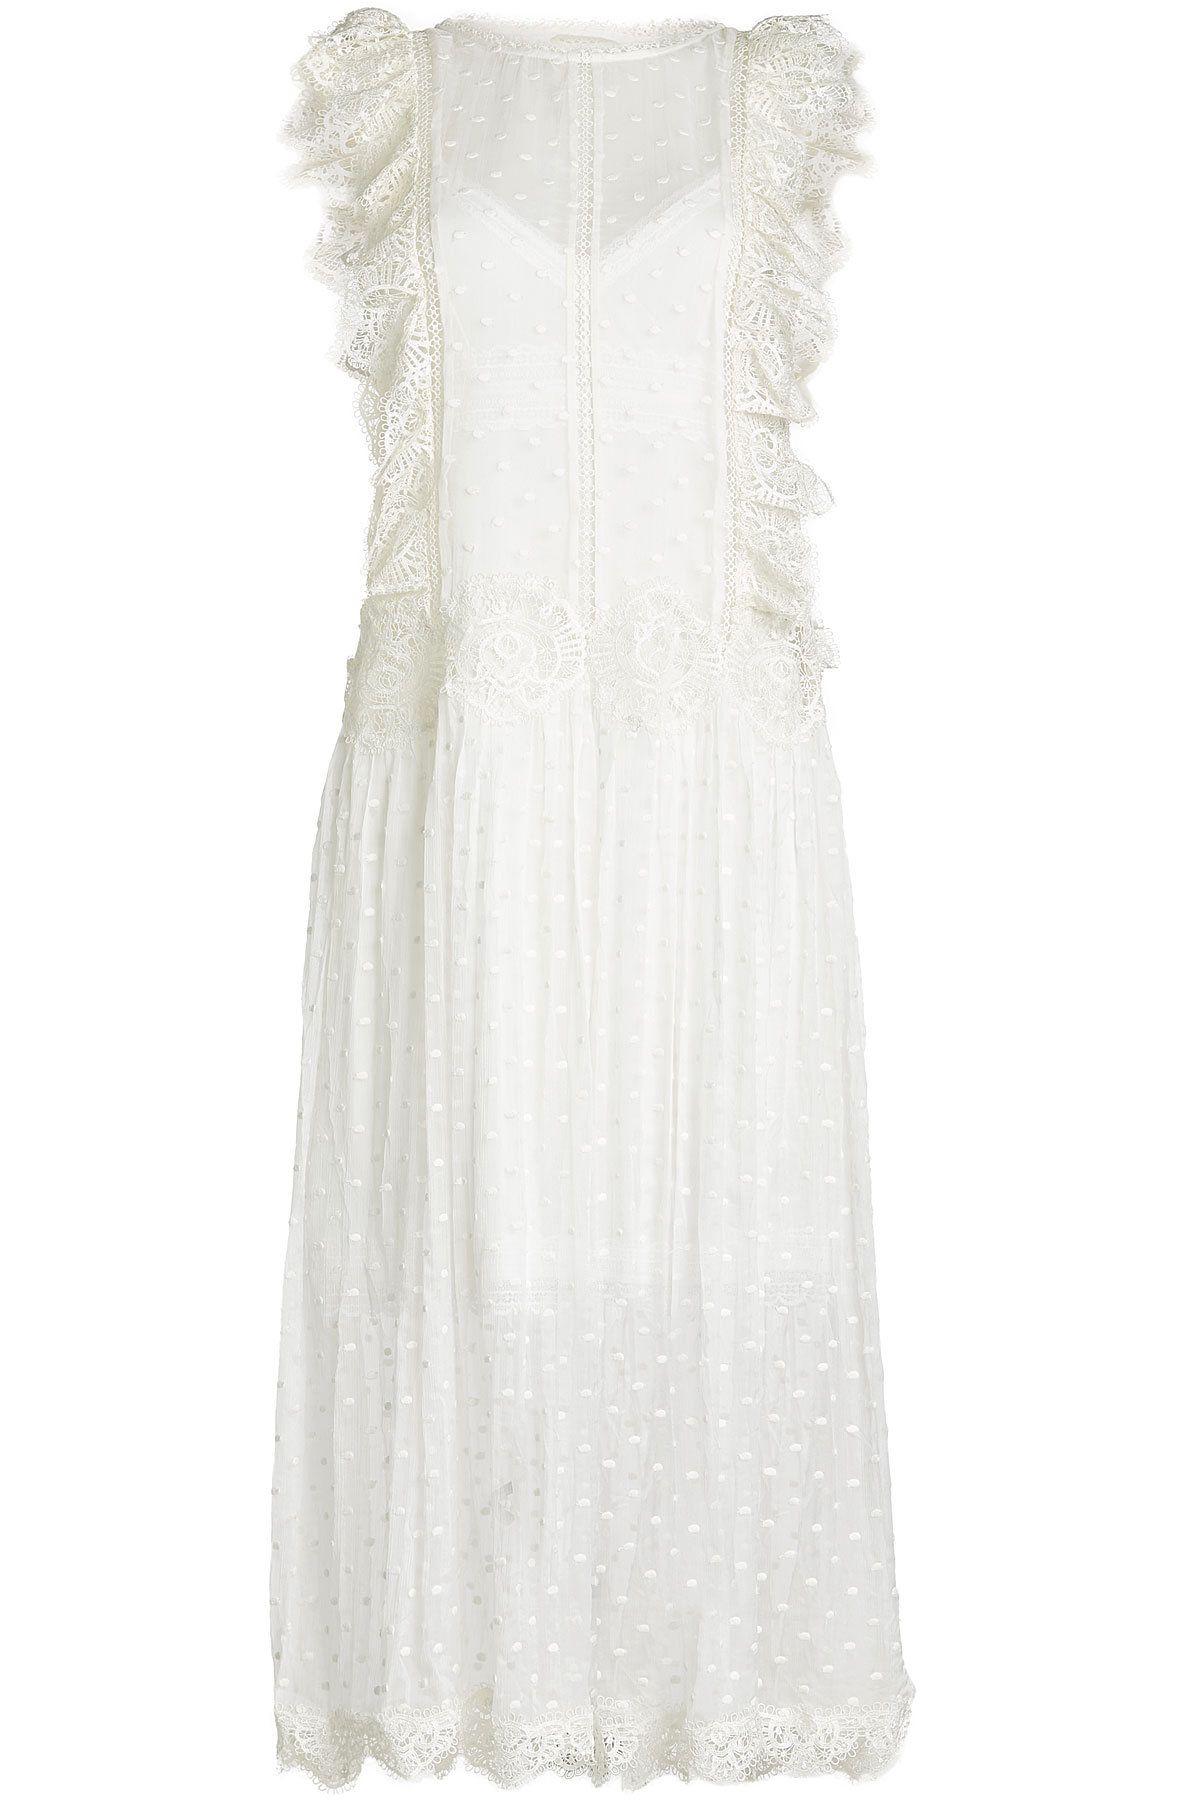 Zimmermann - Embroidered Silk Dress with Crochet